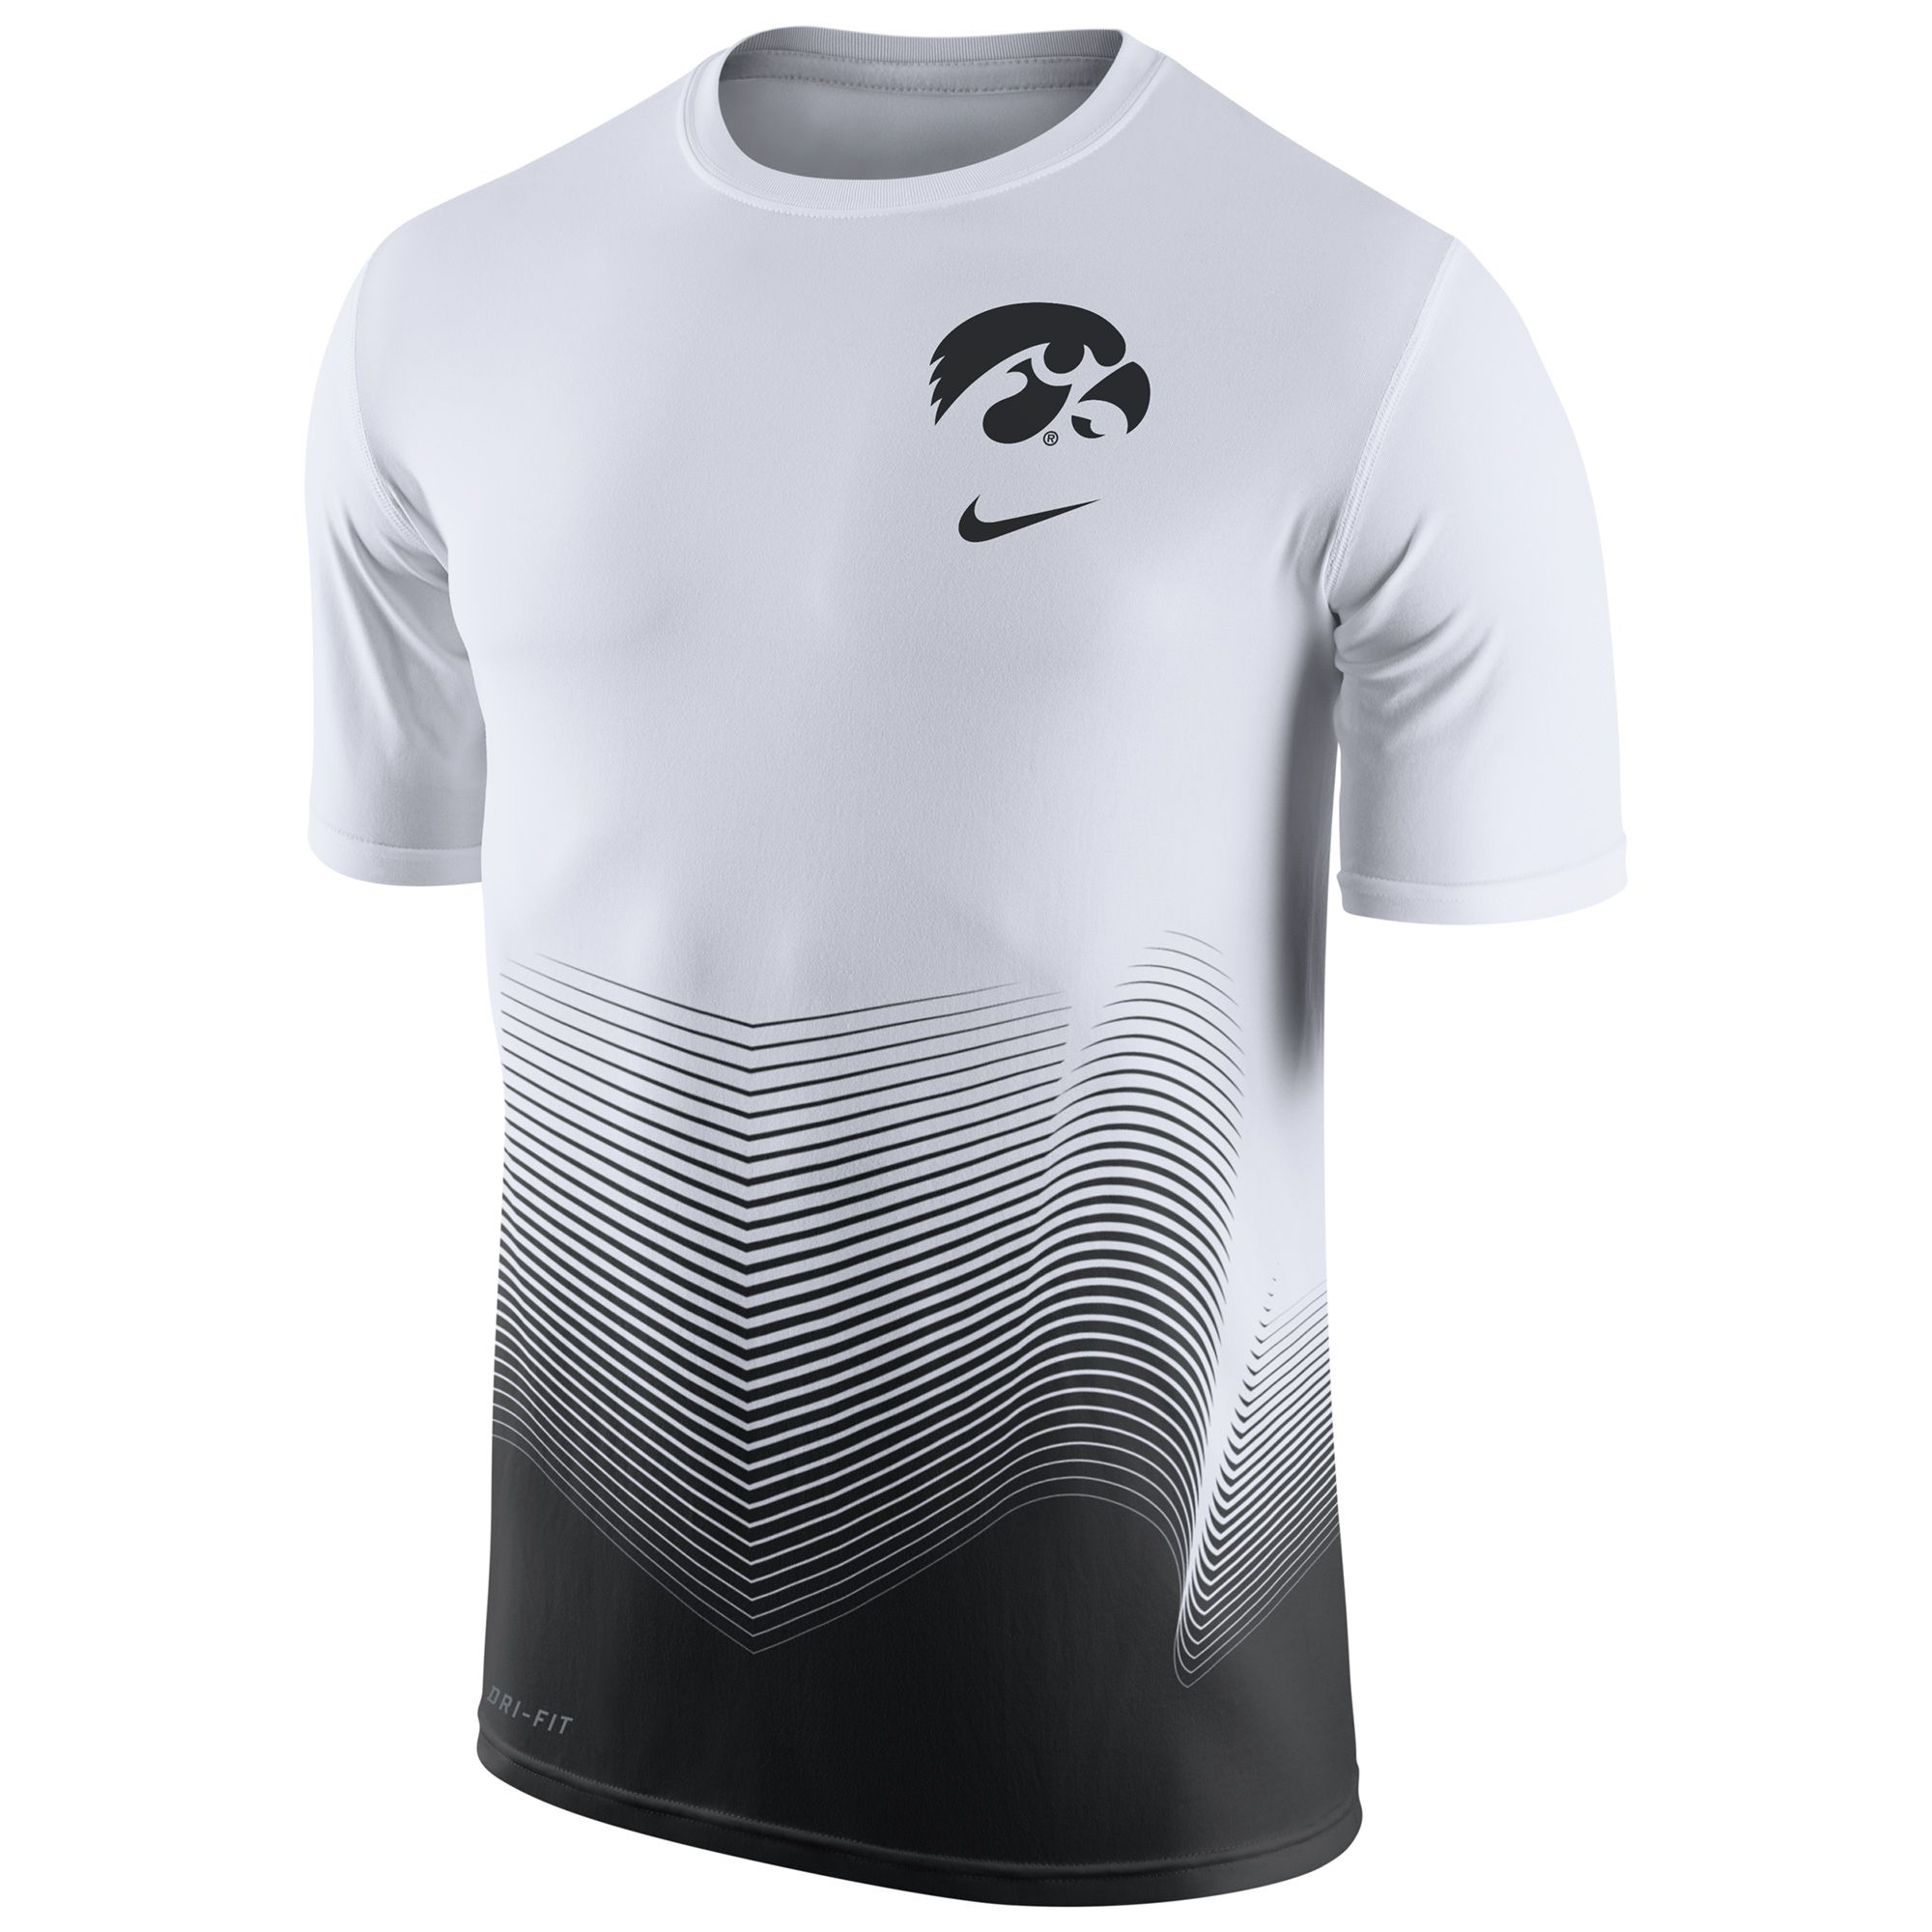 College Iowa Hawkeyes Nike 2016 Basketball Disruption Player Dri Fit T Shirt White Basketball T Shirt Designs Dri Fit T Shirts Basketball Clothes